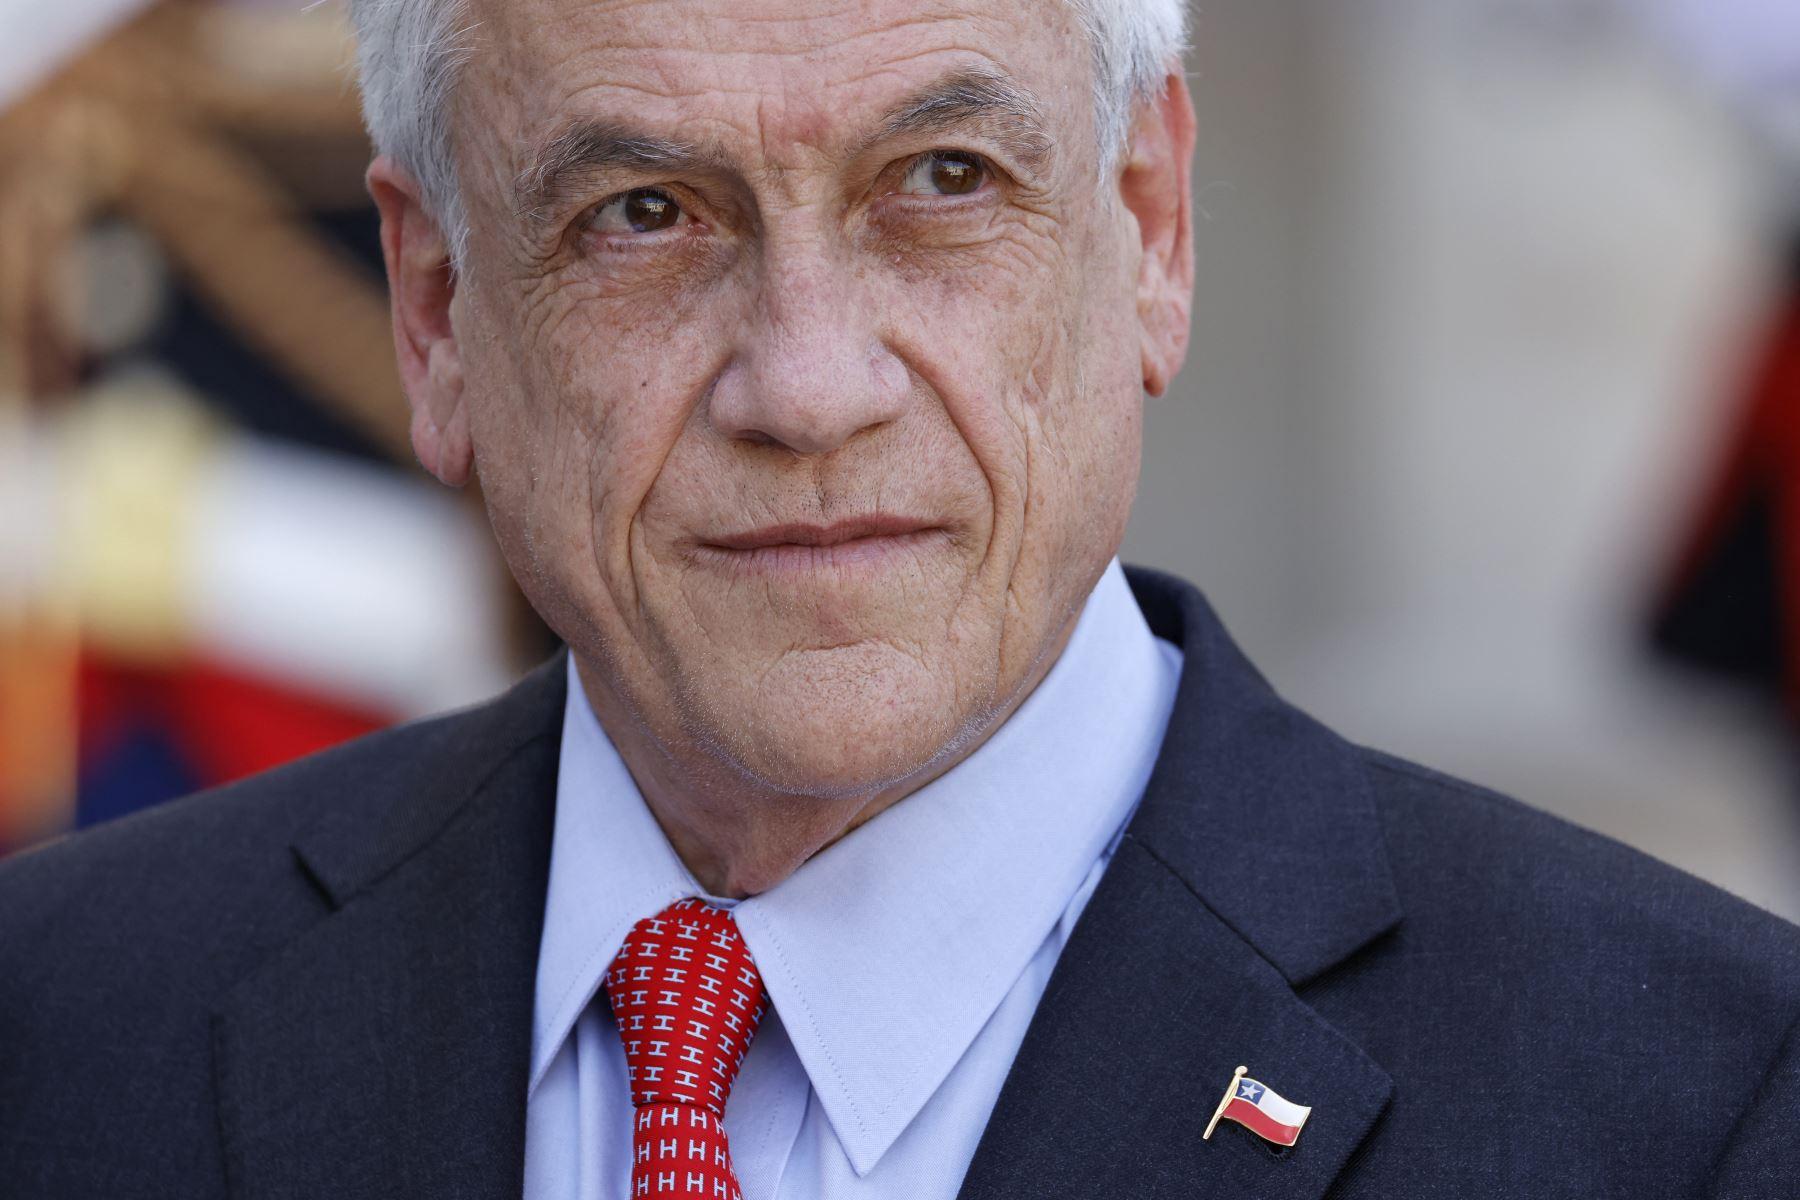 Pandora Papers: fiscalía chilena abre investigación al presidente Sebastián Piñera